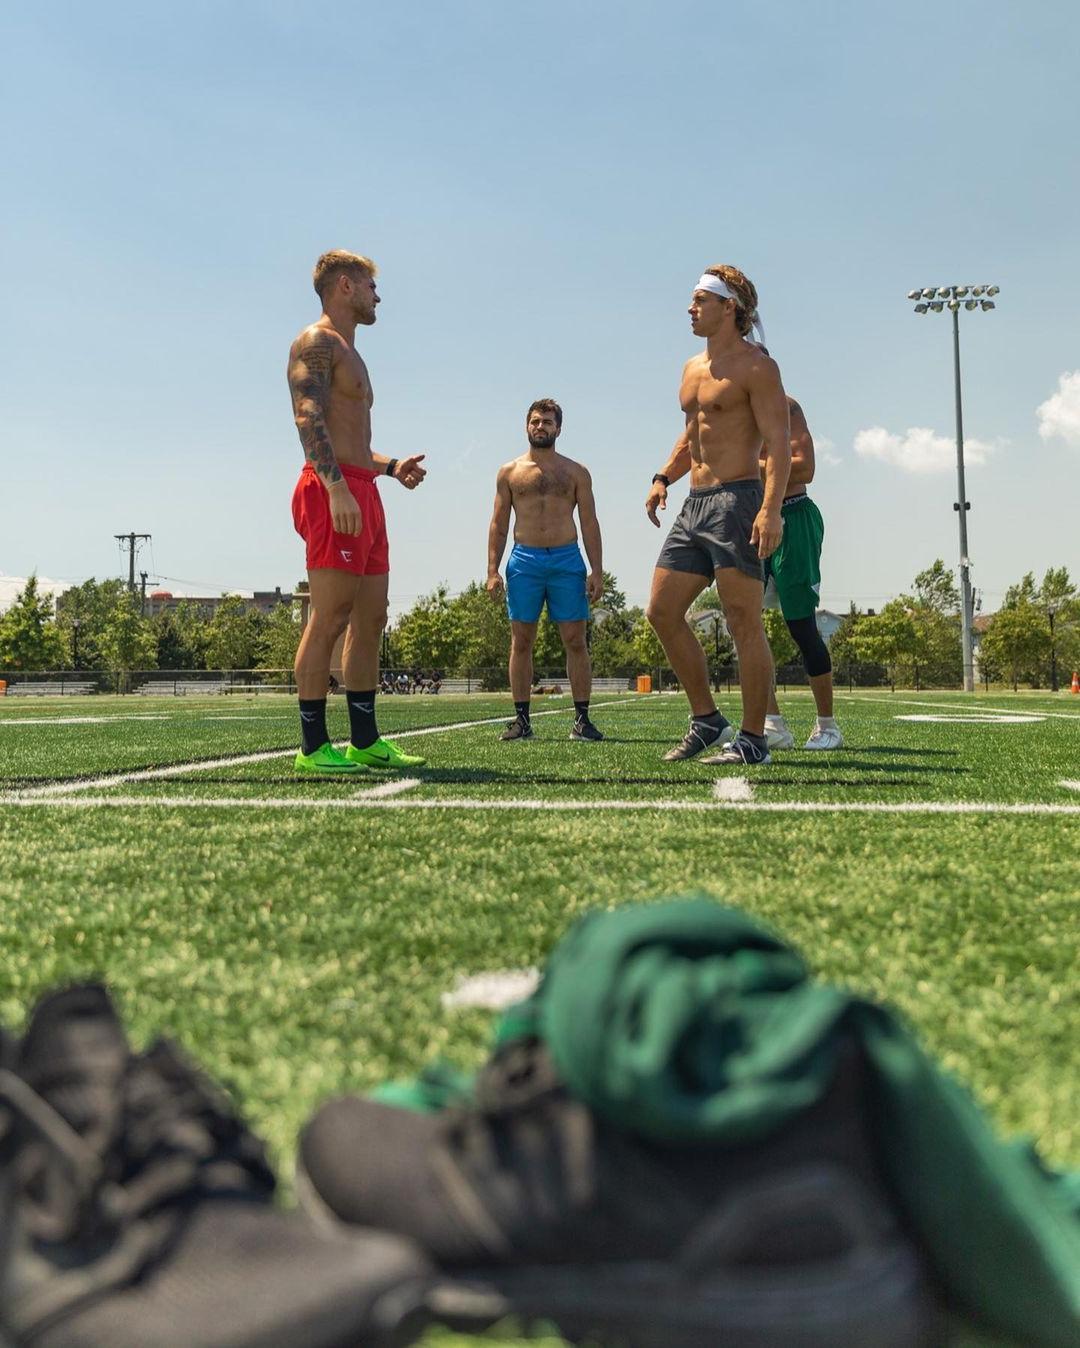 hot-guys-sneakers-playing-field-sportmen-hunks-devon-levesque